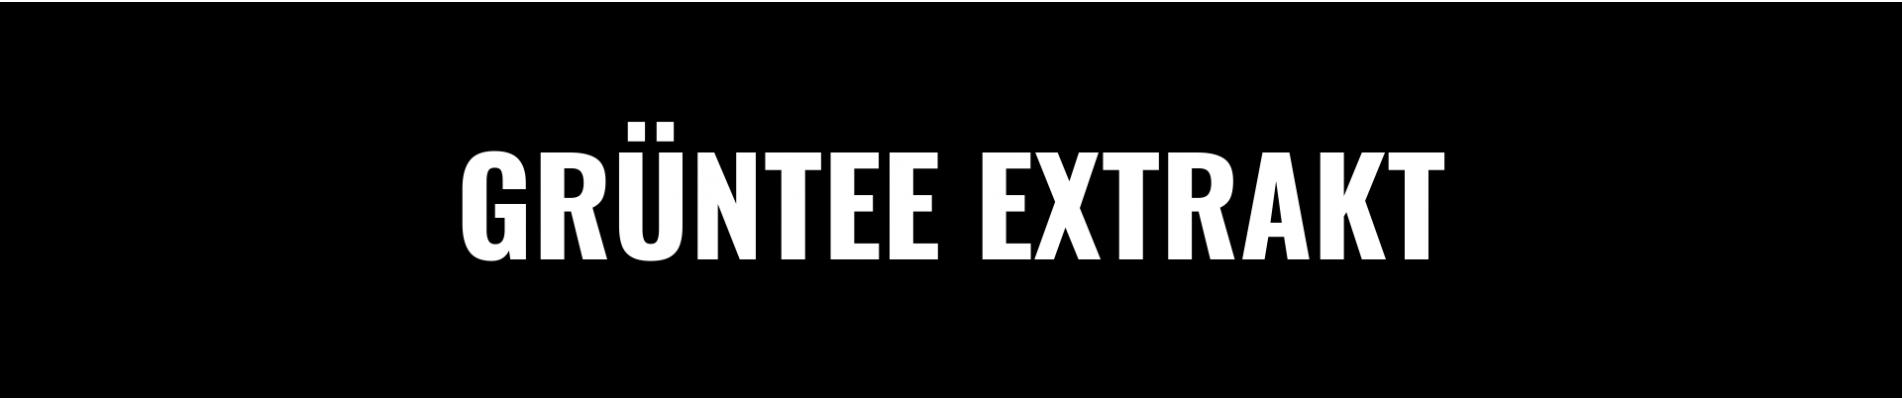 GRÜNTEE EXTRAKT